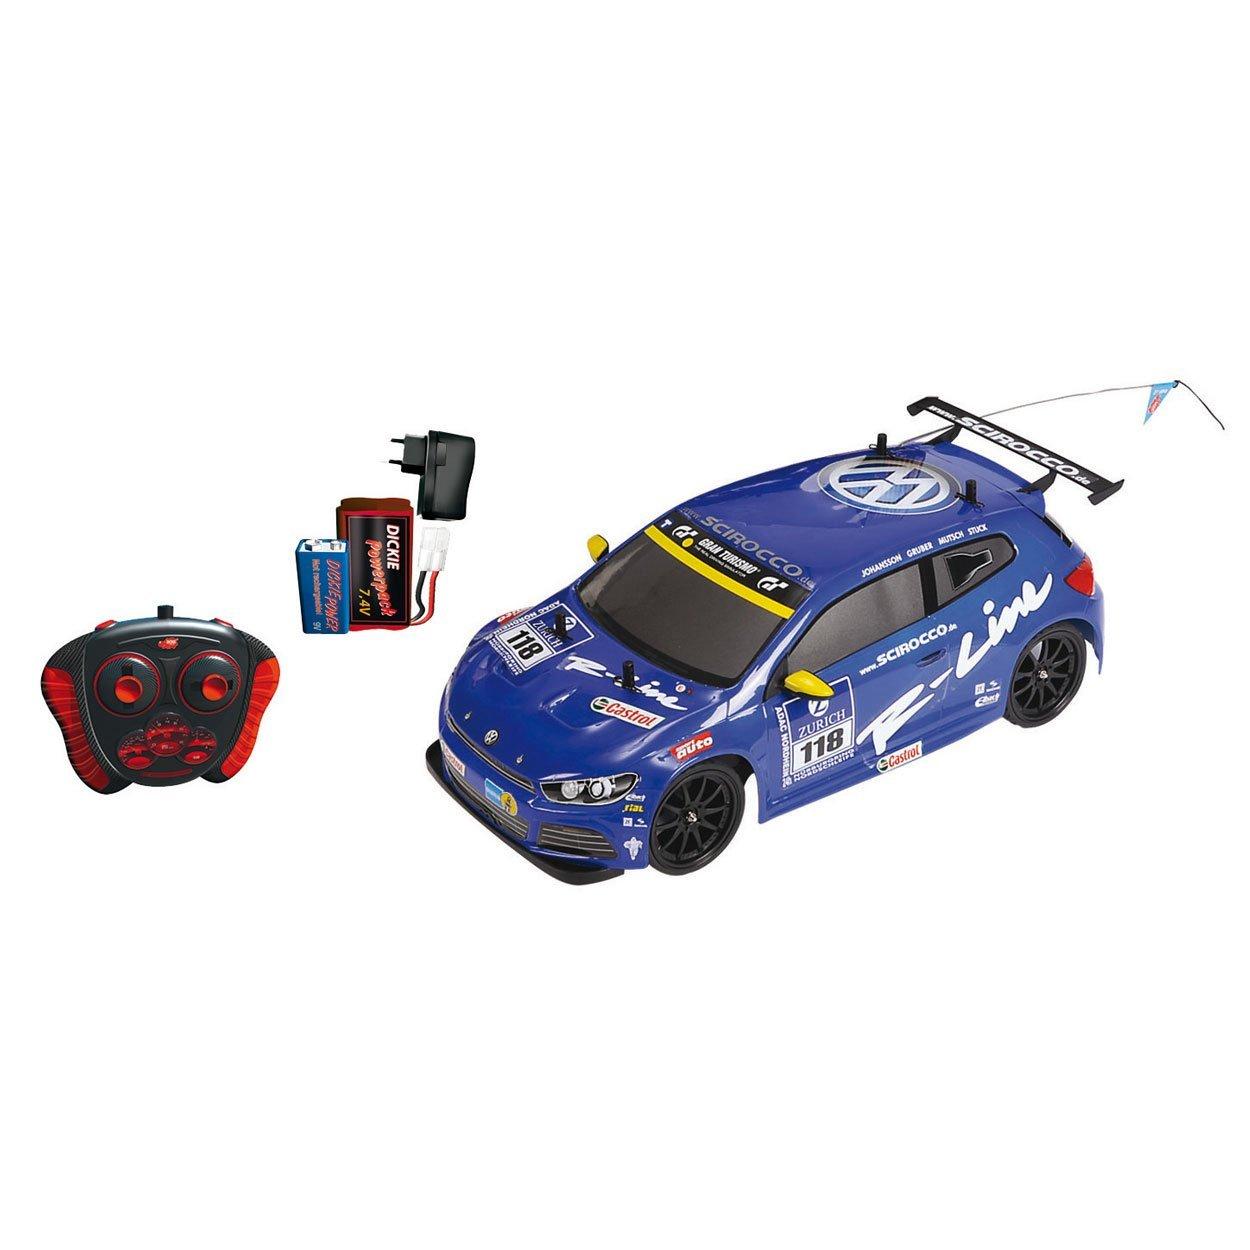 [@Dealclub] Dickie-Spielzeug VW Scirocco 2-Kanal Funkfernsteuerung-Fahrzeug (+3% shoop)